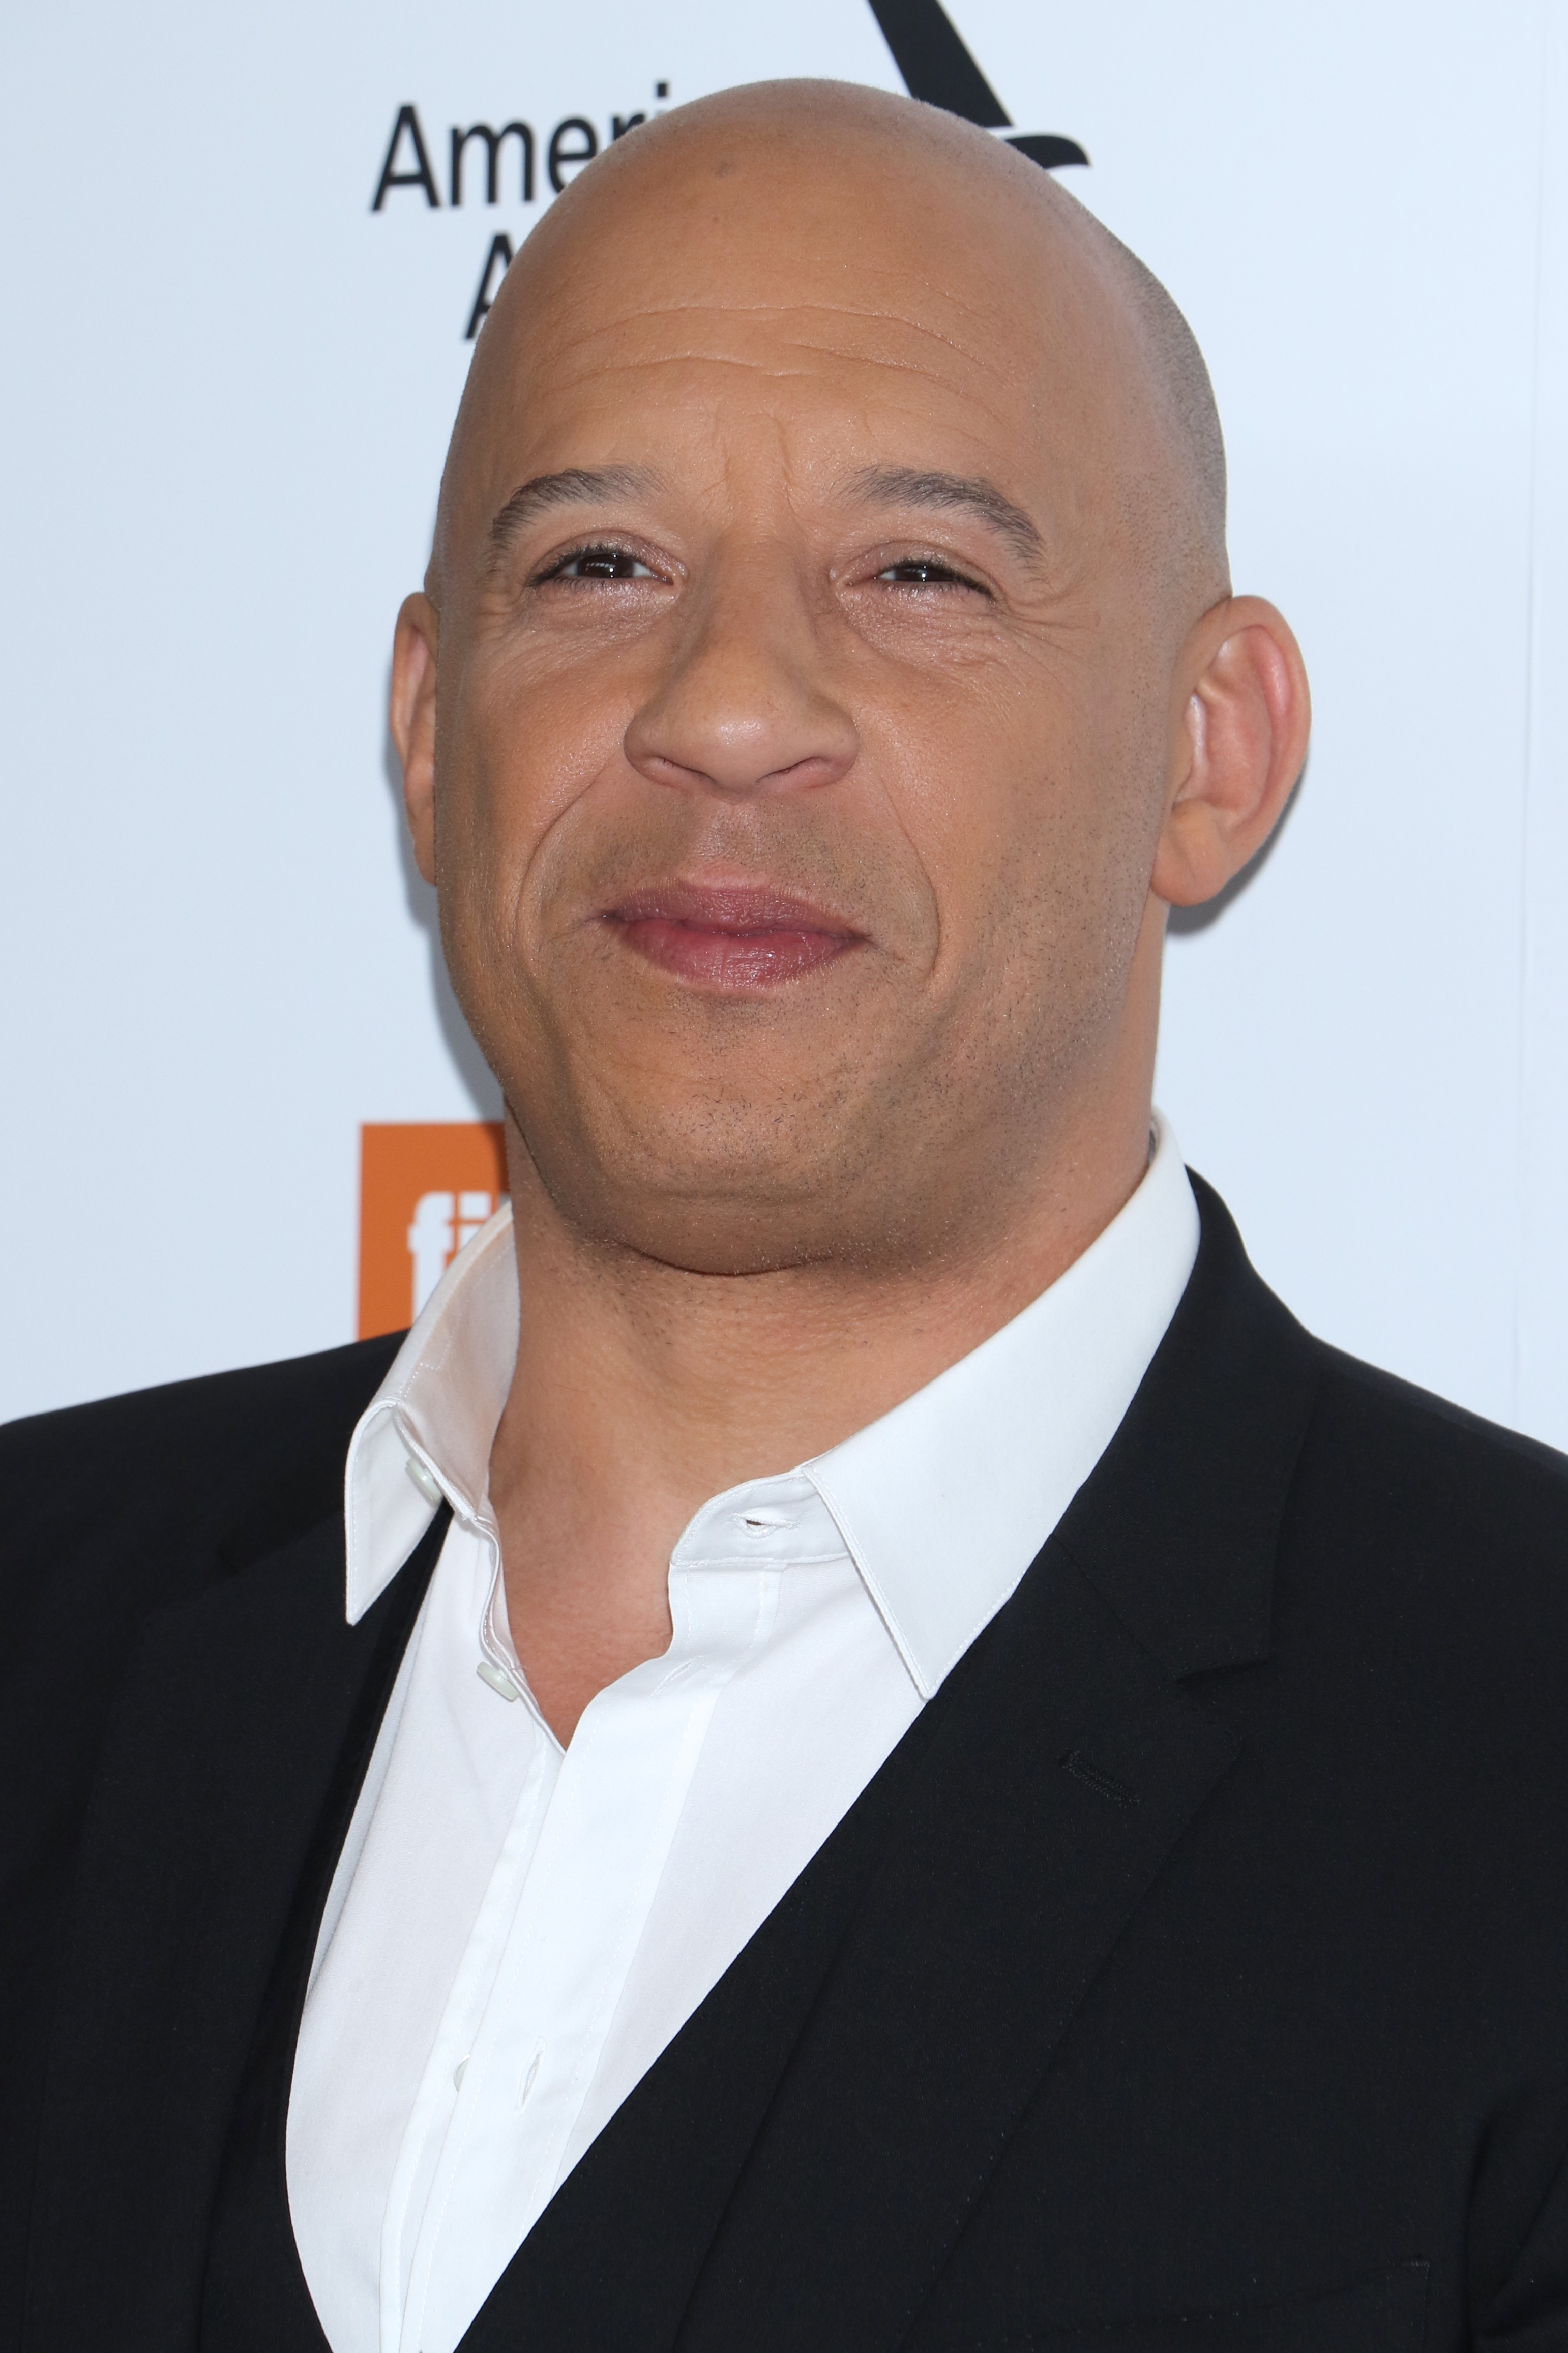 Vin Diesel attends the Chaplin Award Gala in New York City on April 30, 2018.